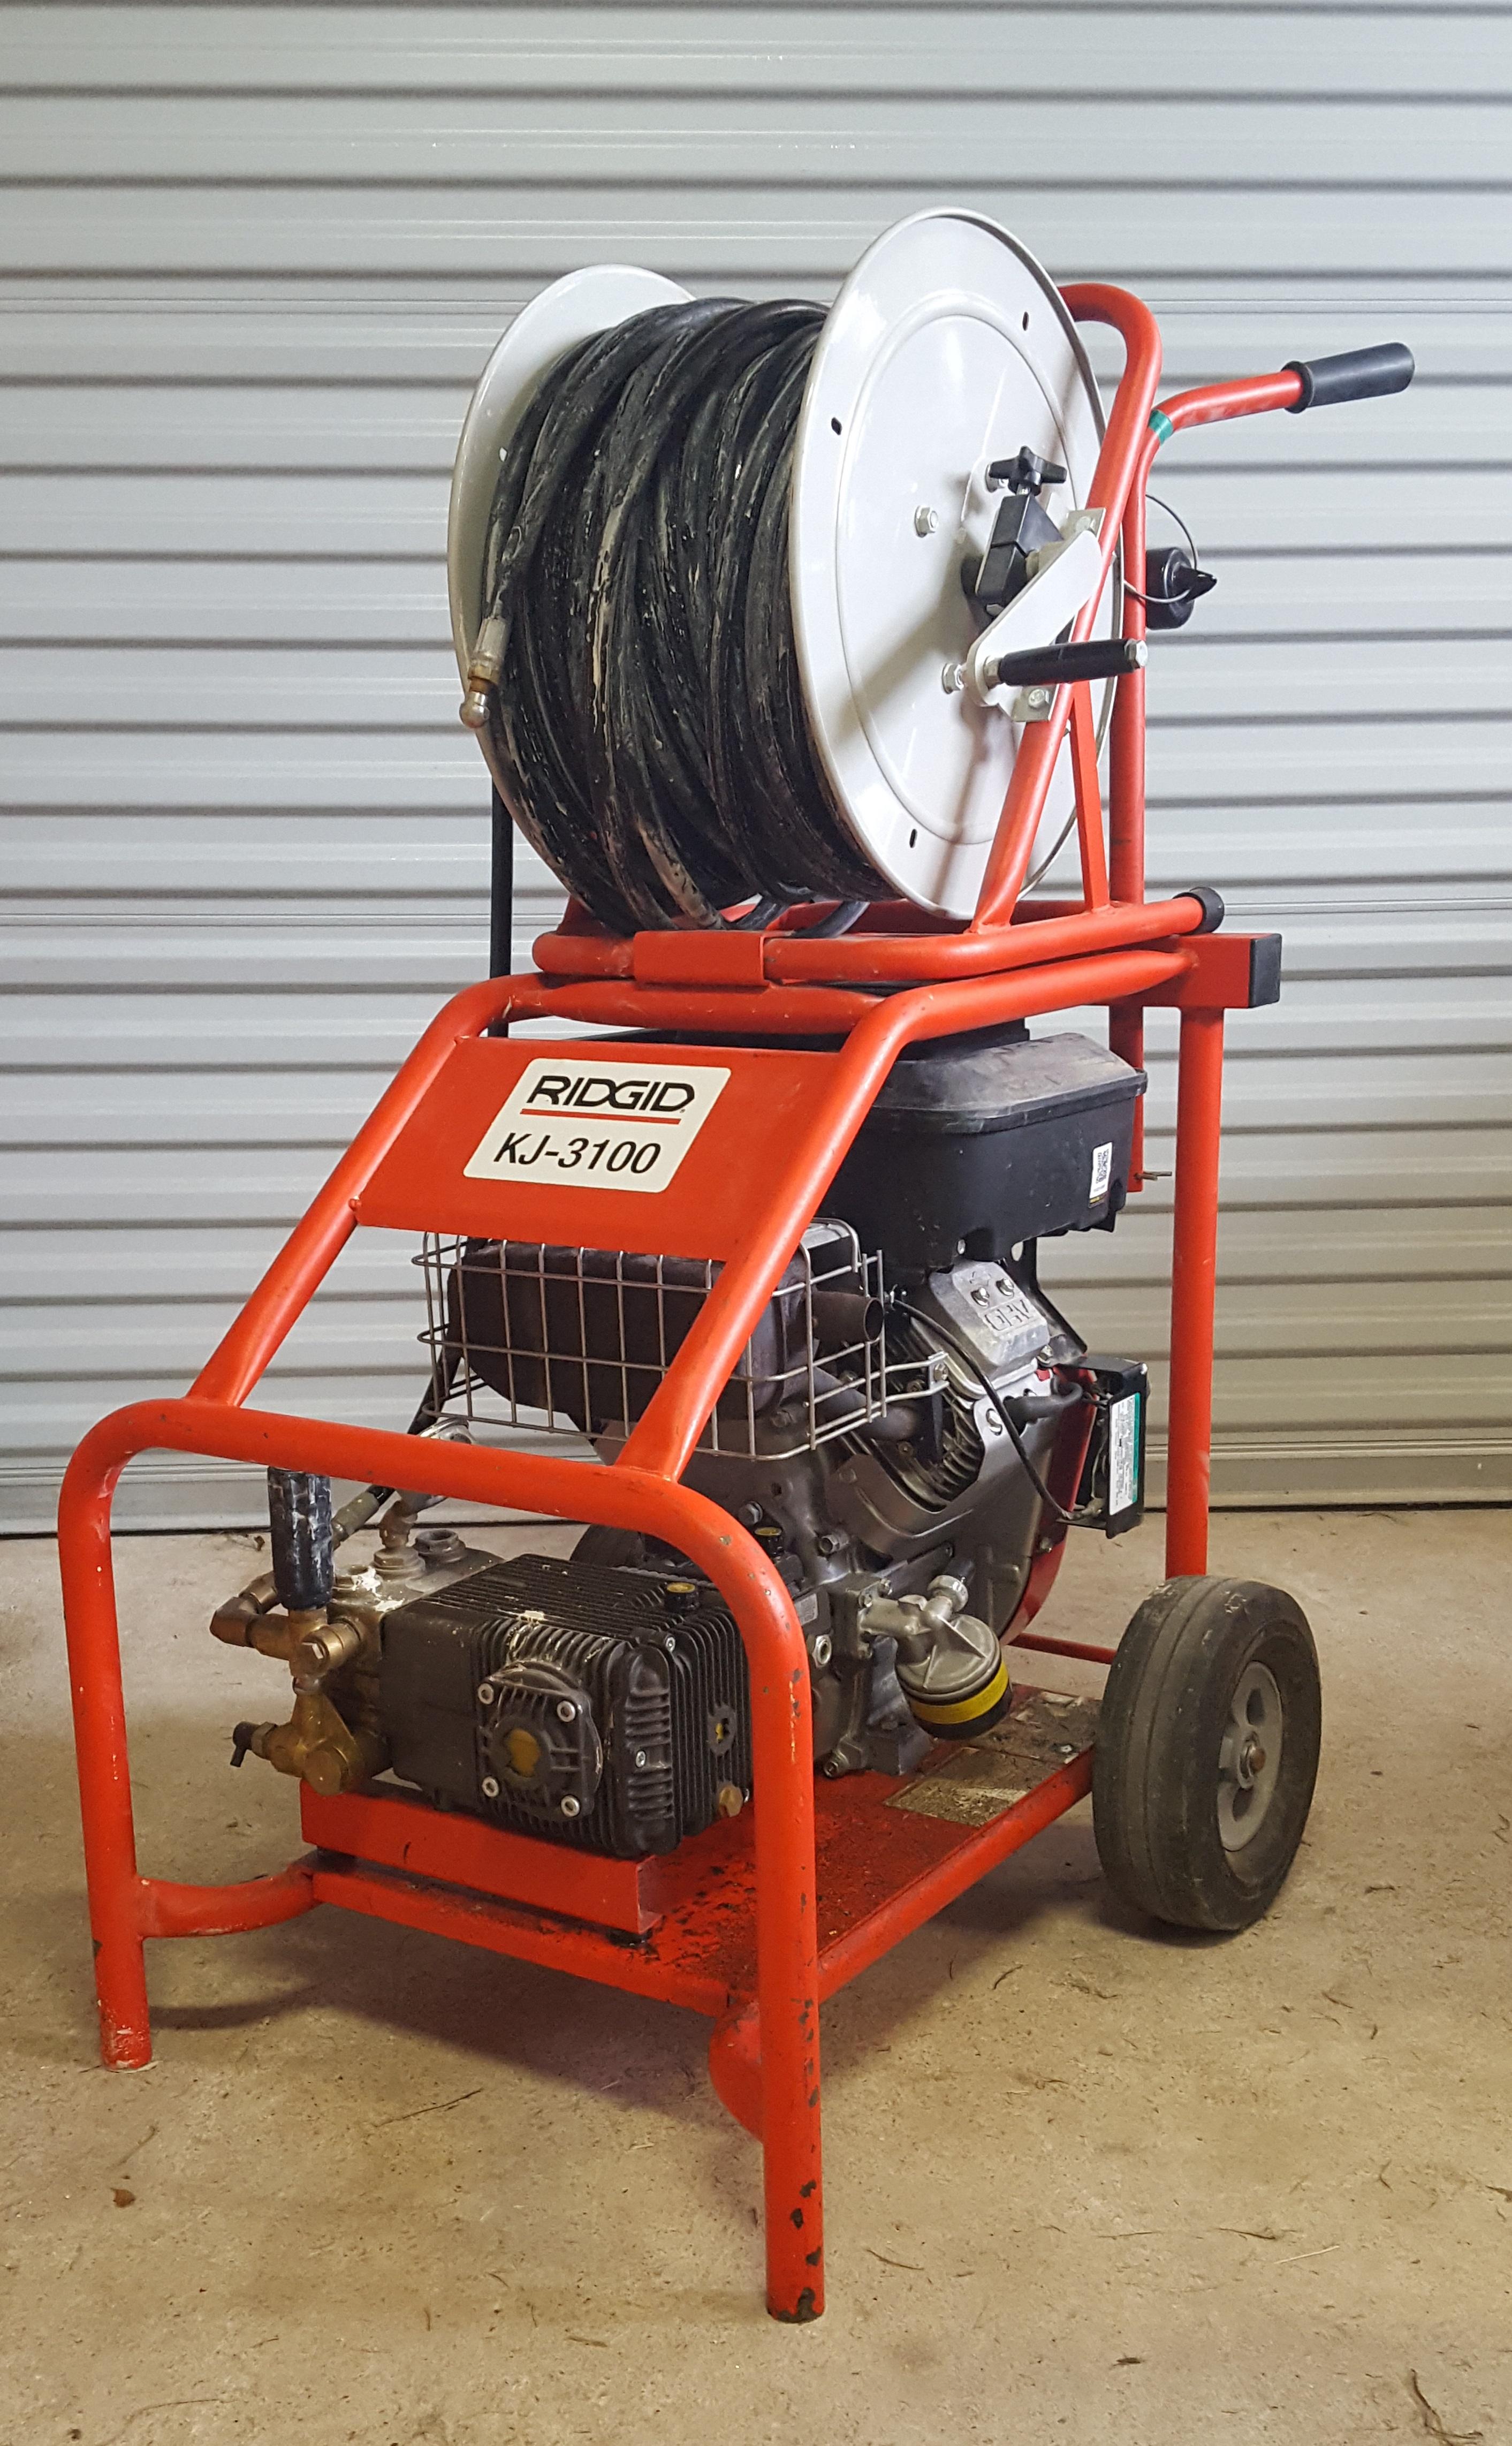 4,000 psi RIGID KJ-3100